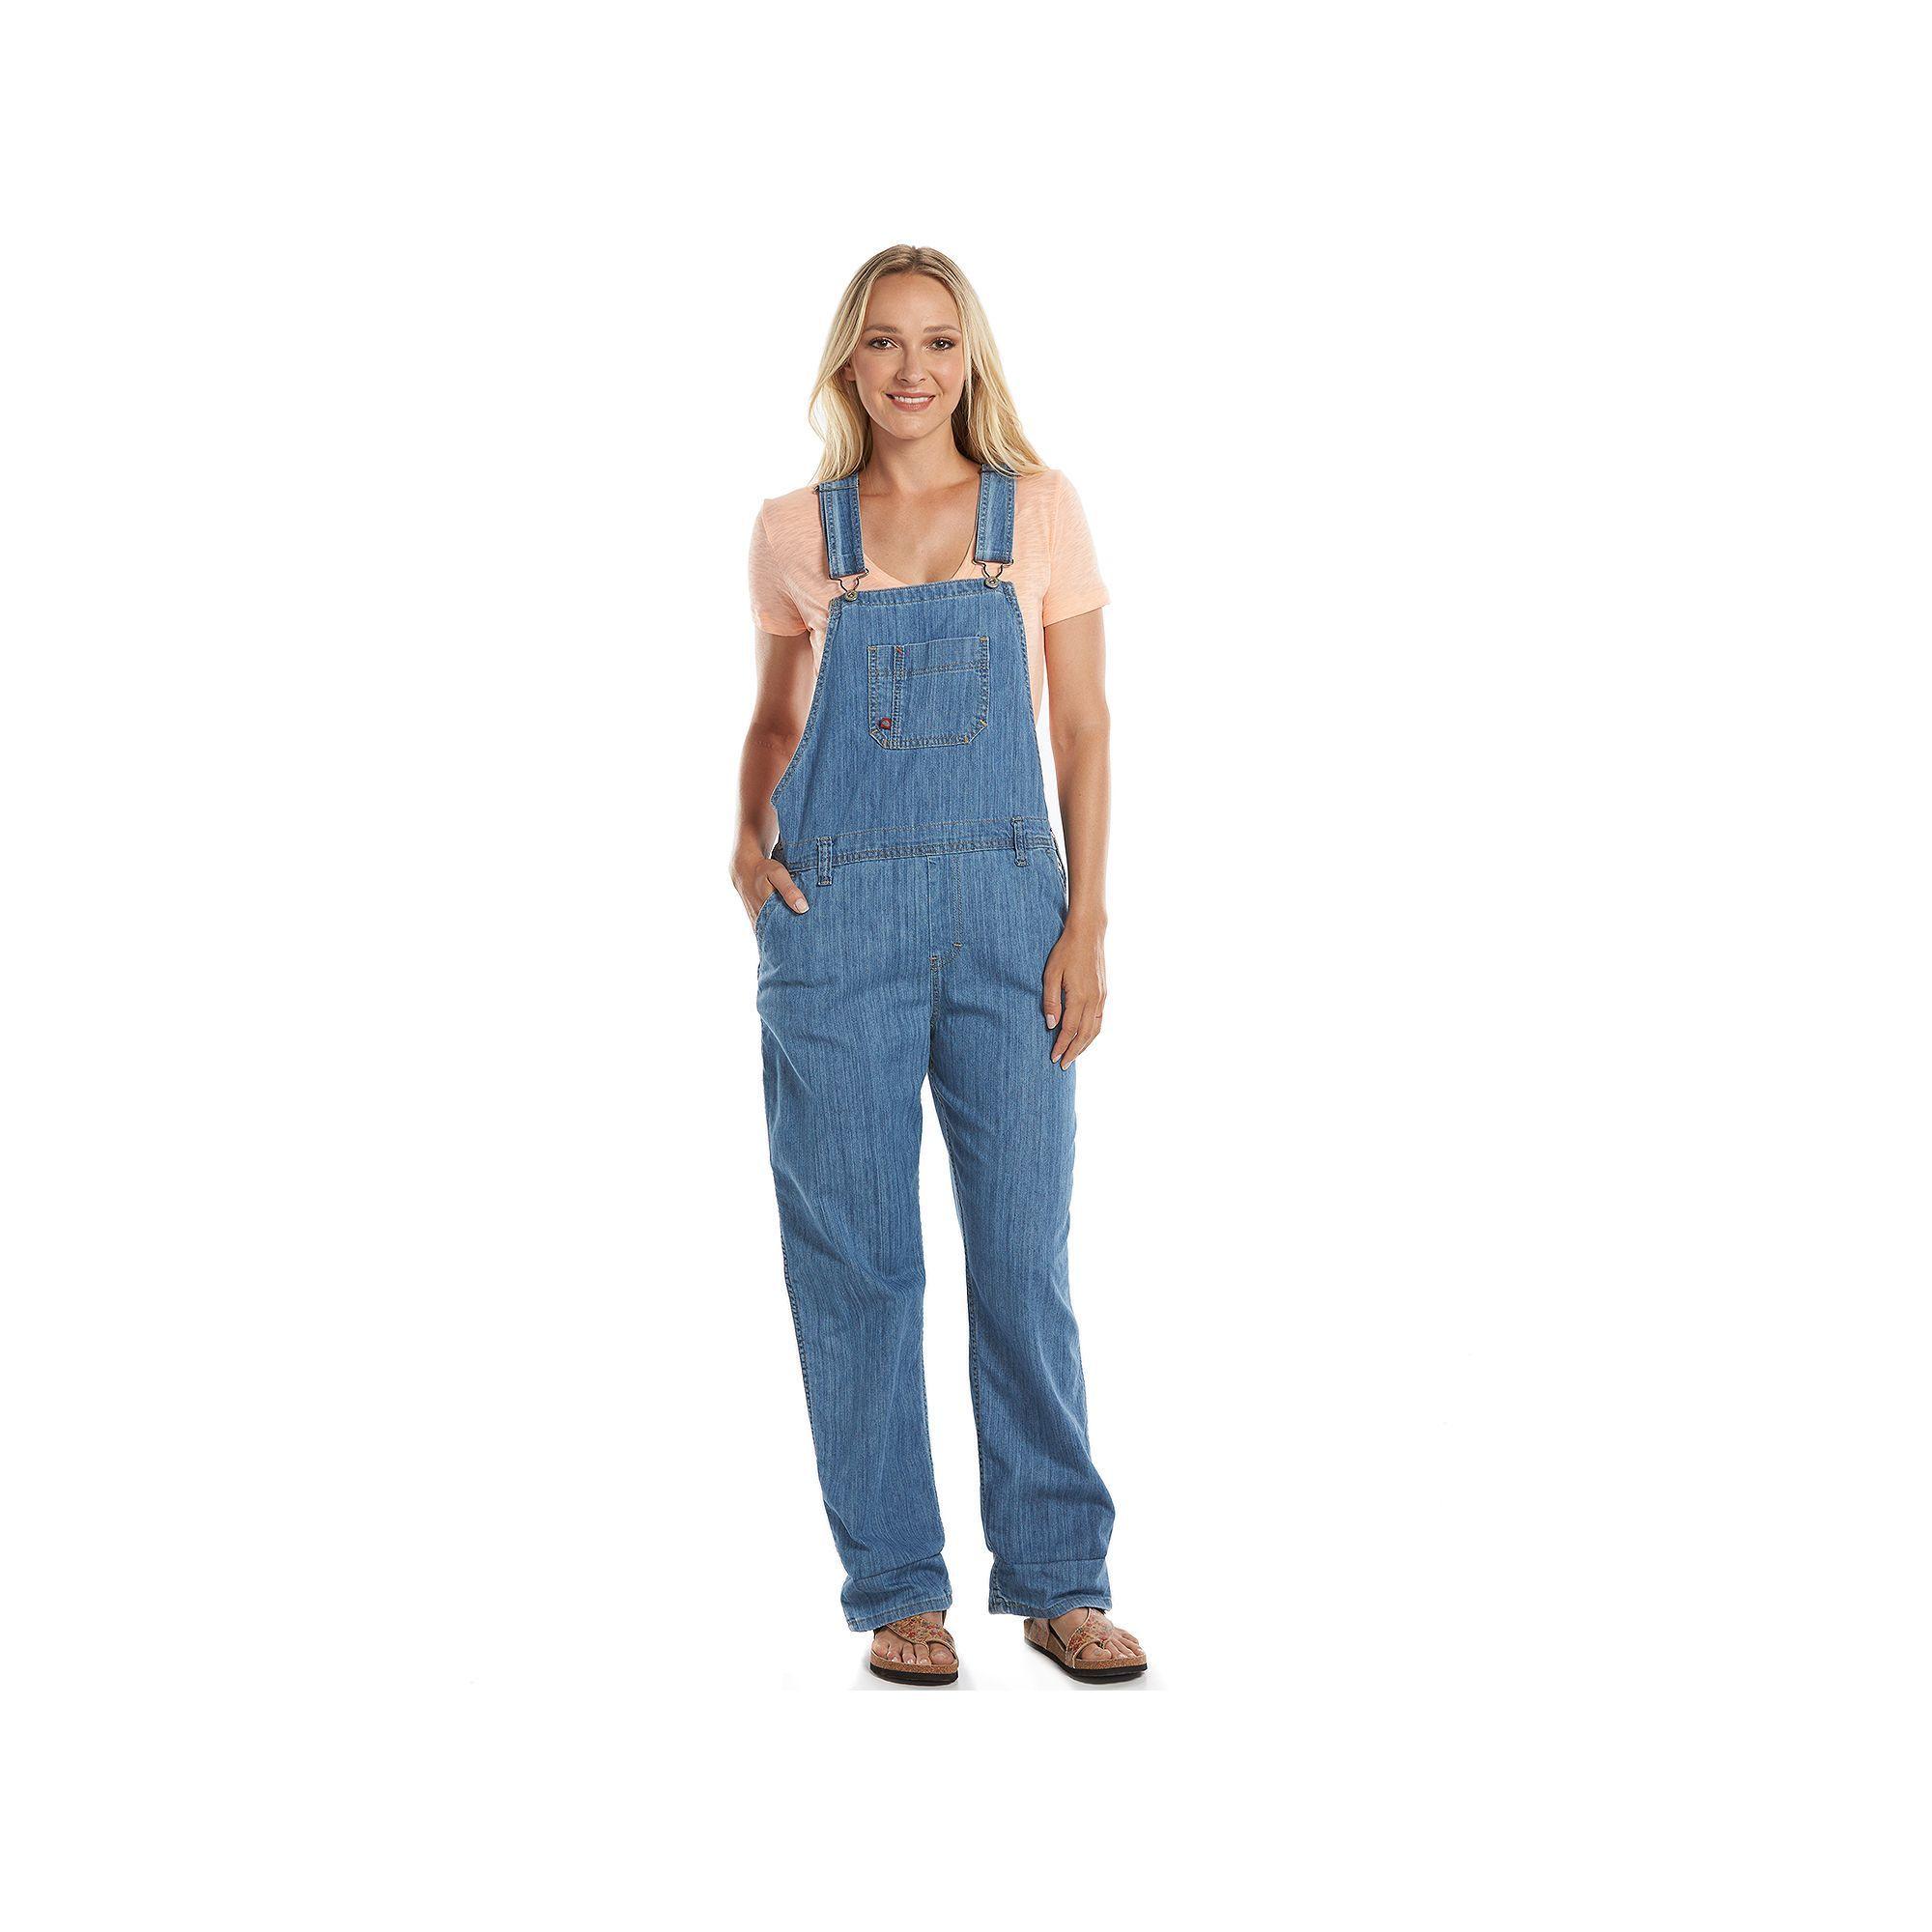 eaacc085920 Dickies Relaxed Straight-Leg Denim Bib Overalls - Women s